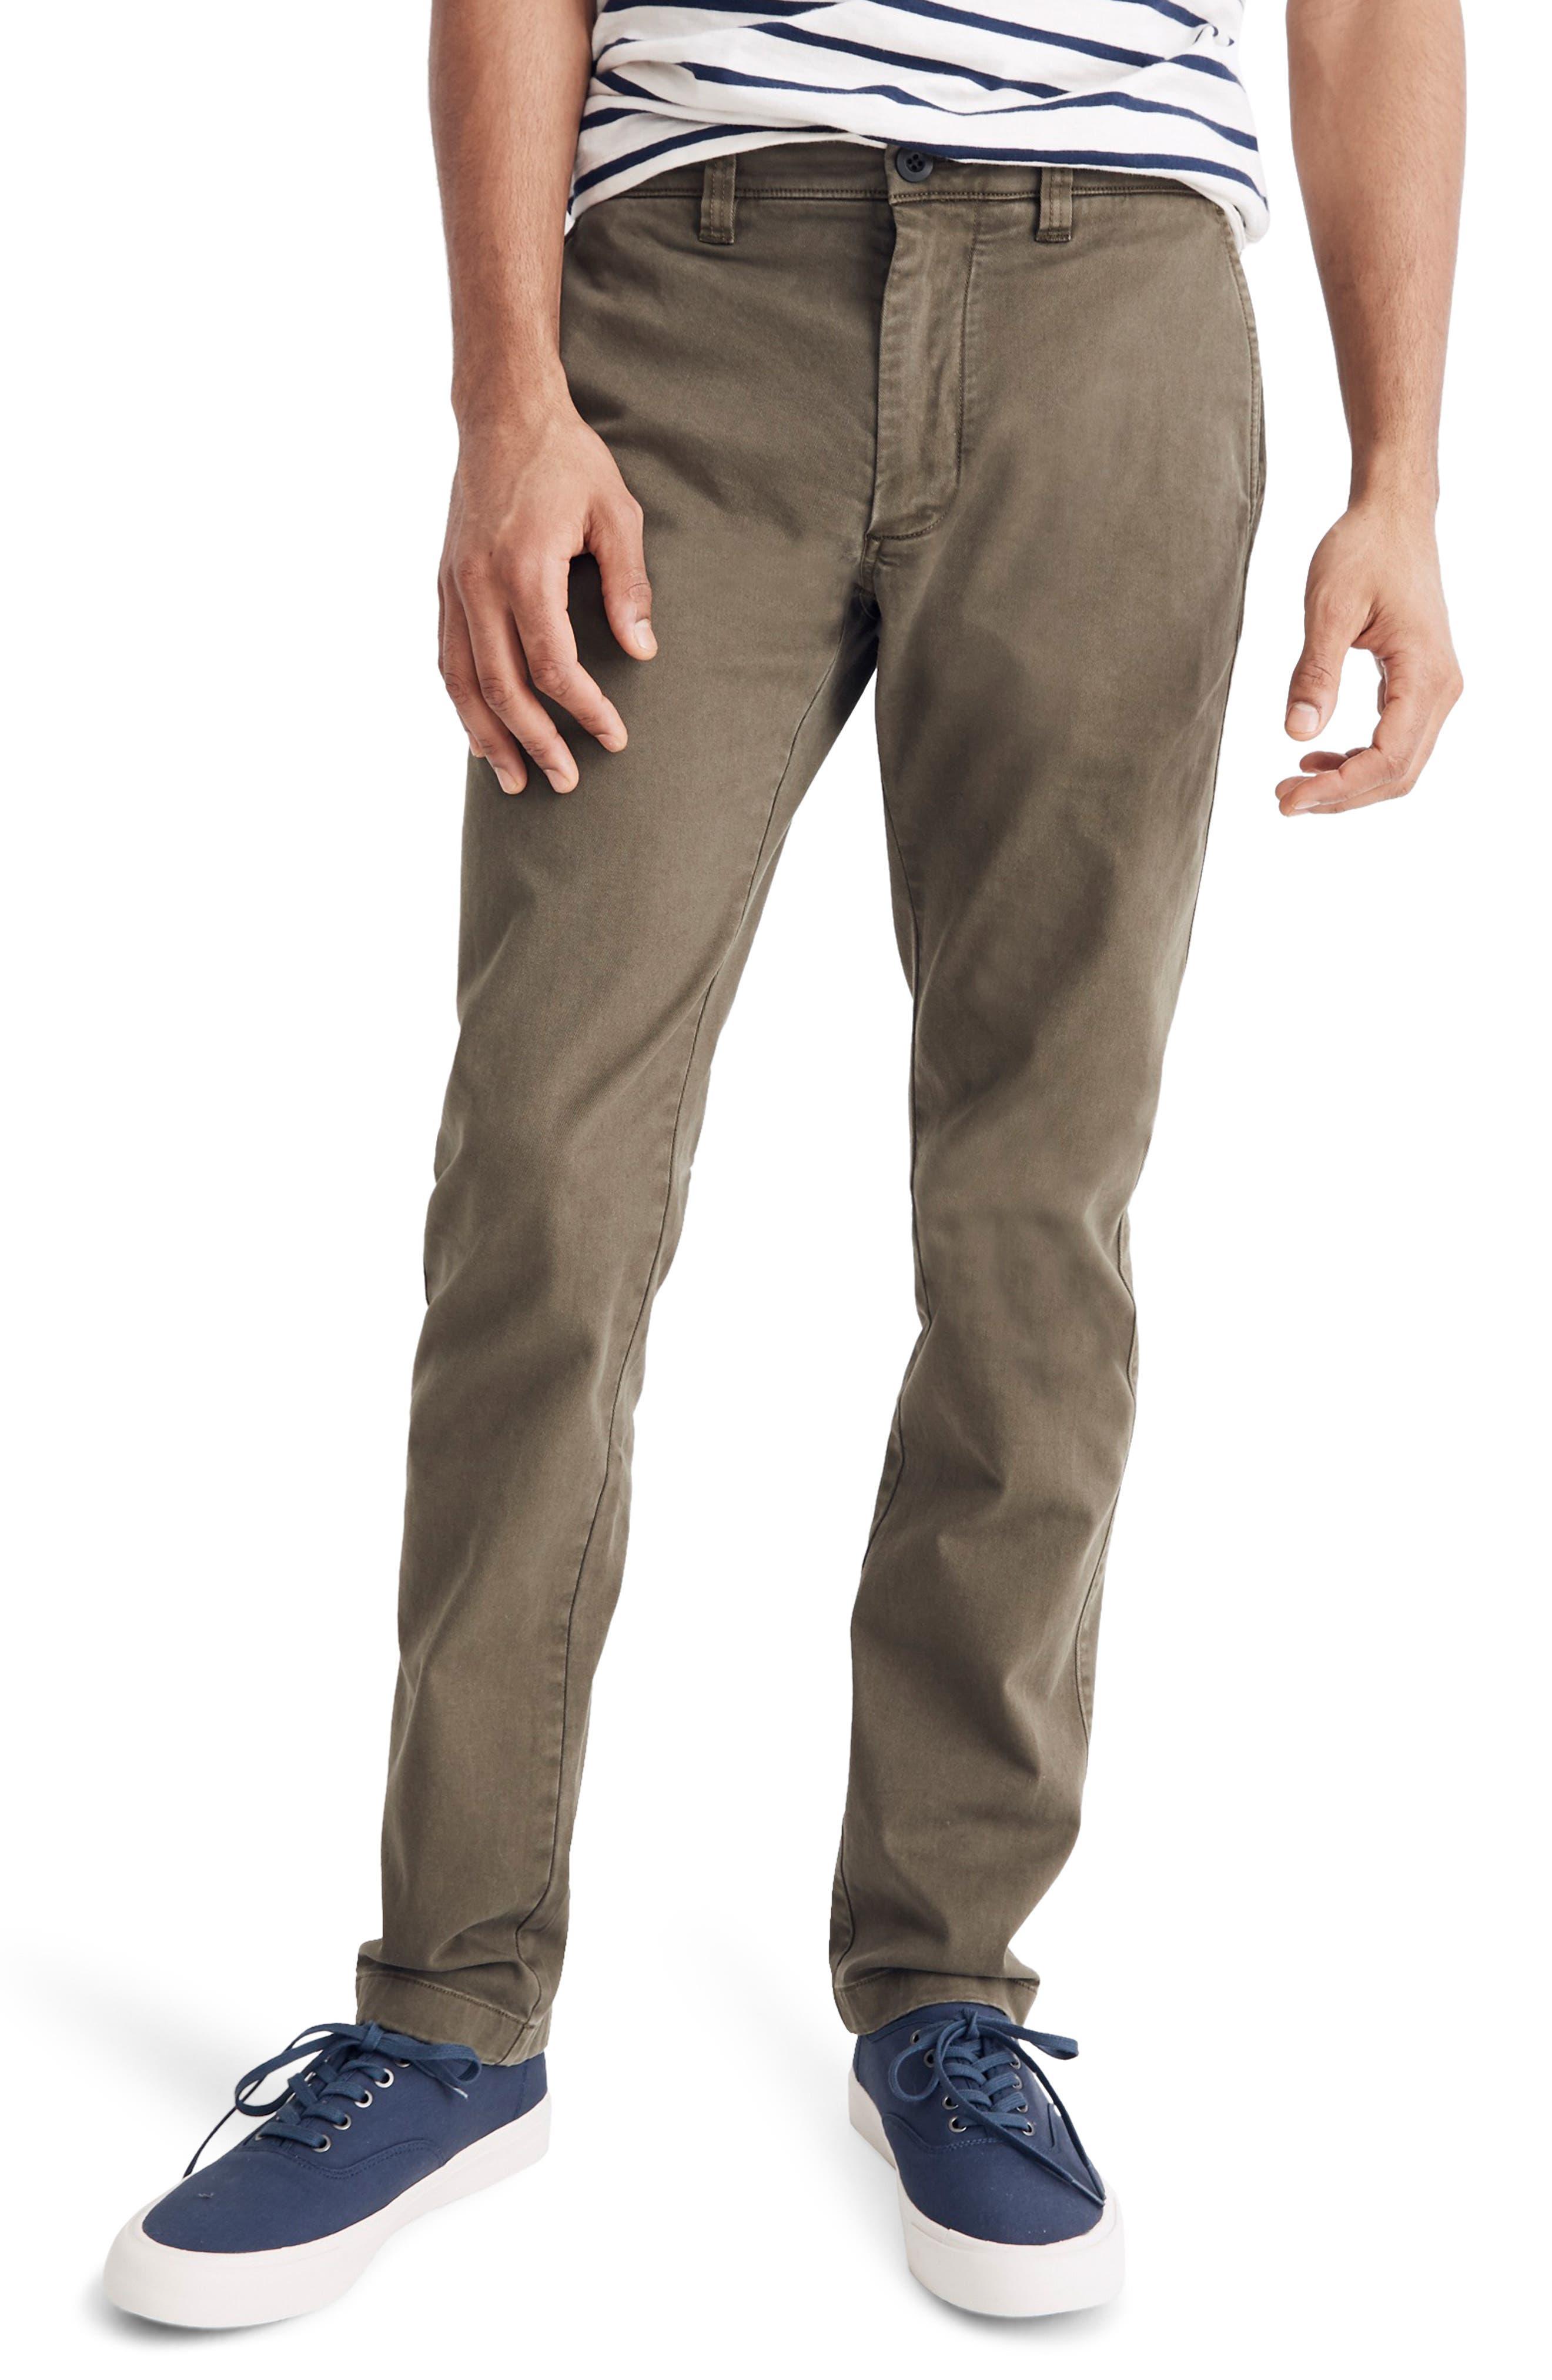 Madewell Penn Slim Fit Chino Pants, Green